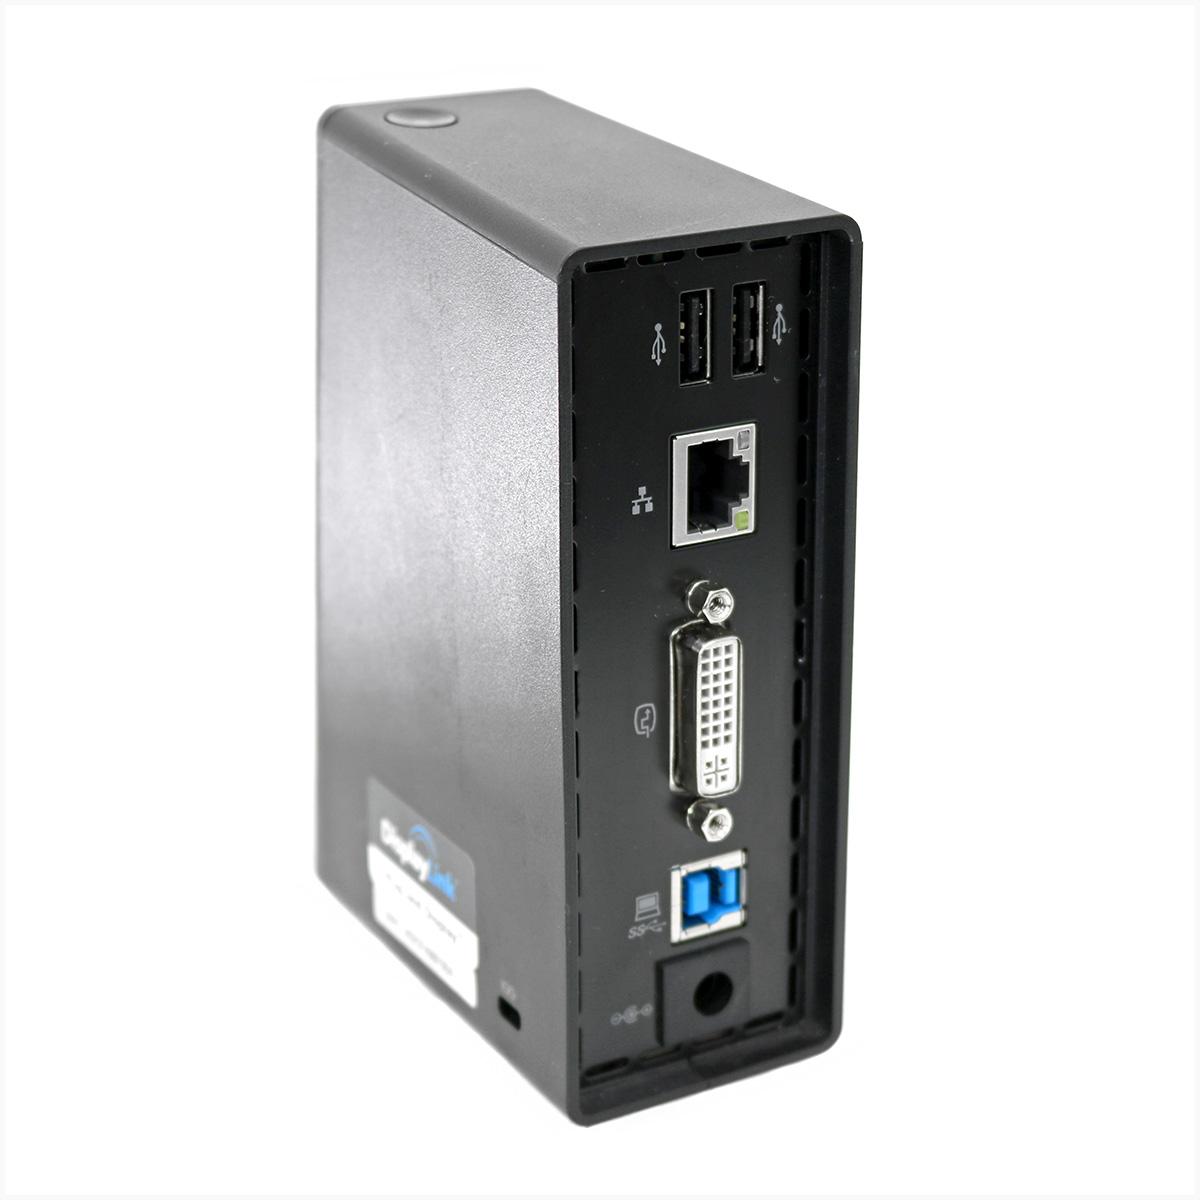 Dockstation lenovo thinkpad basic dl3700-ess - usado